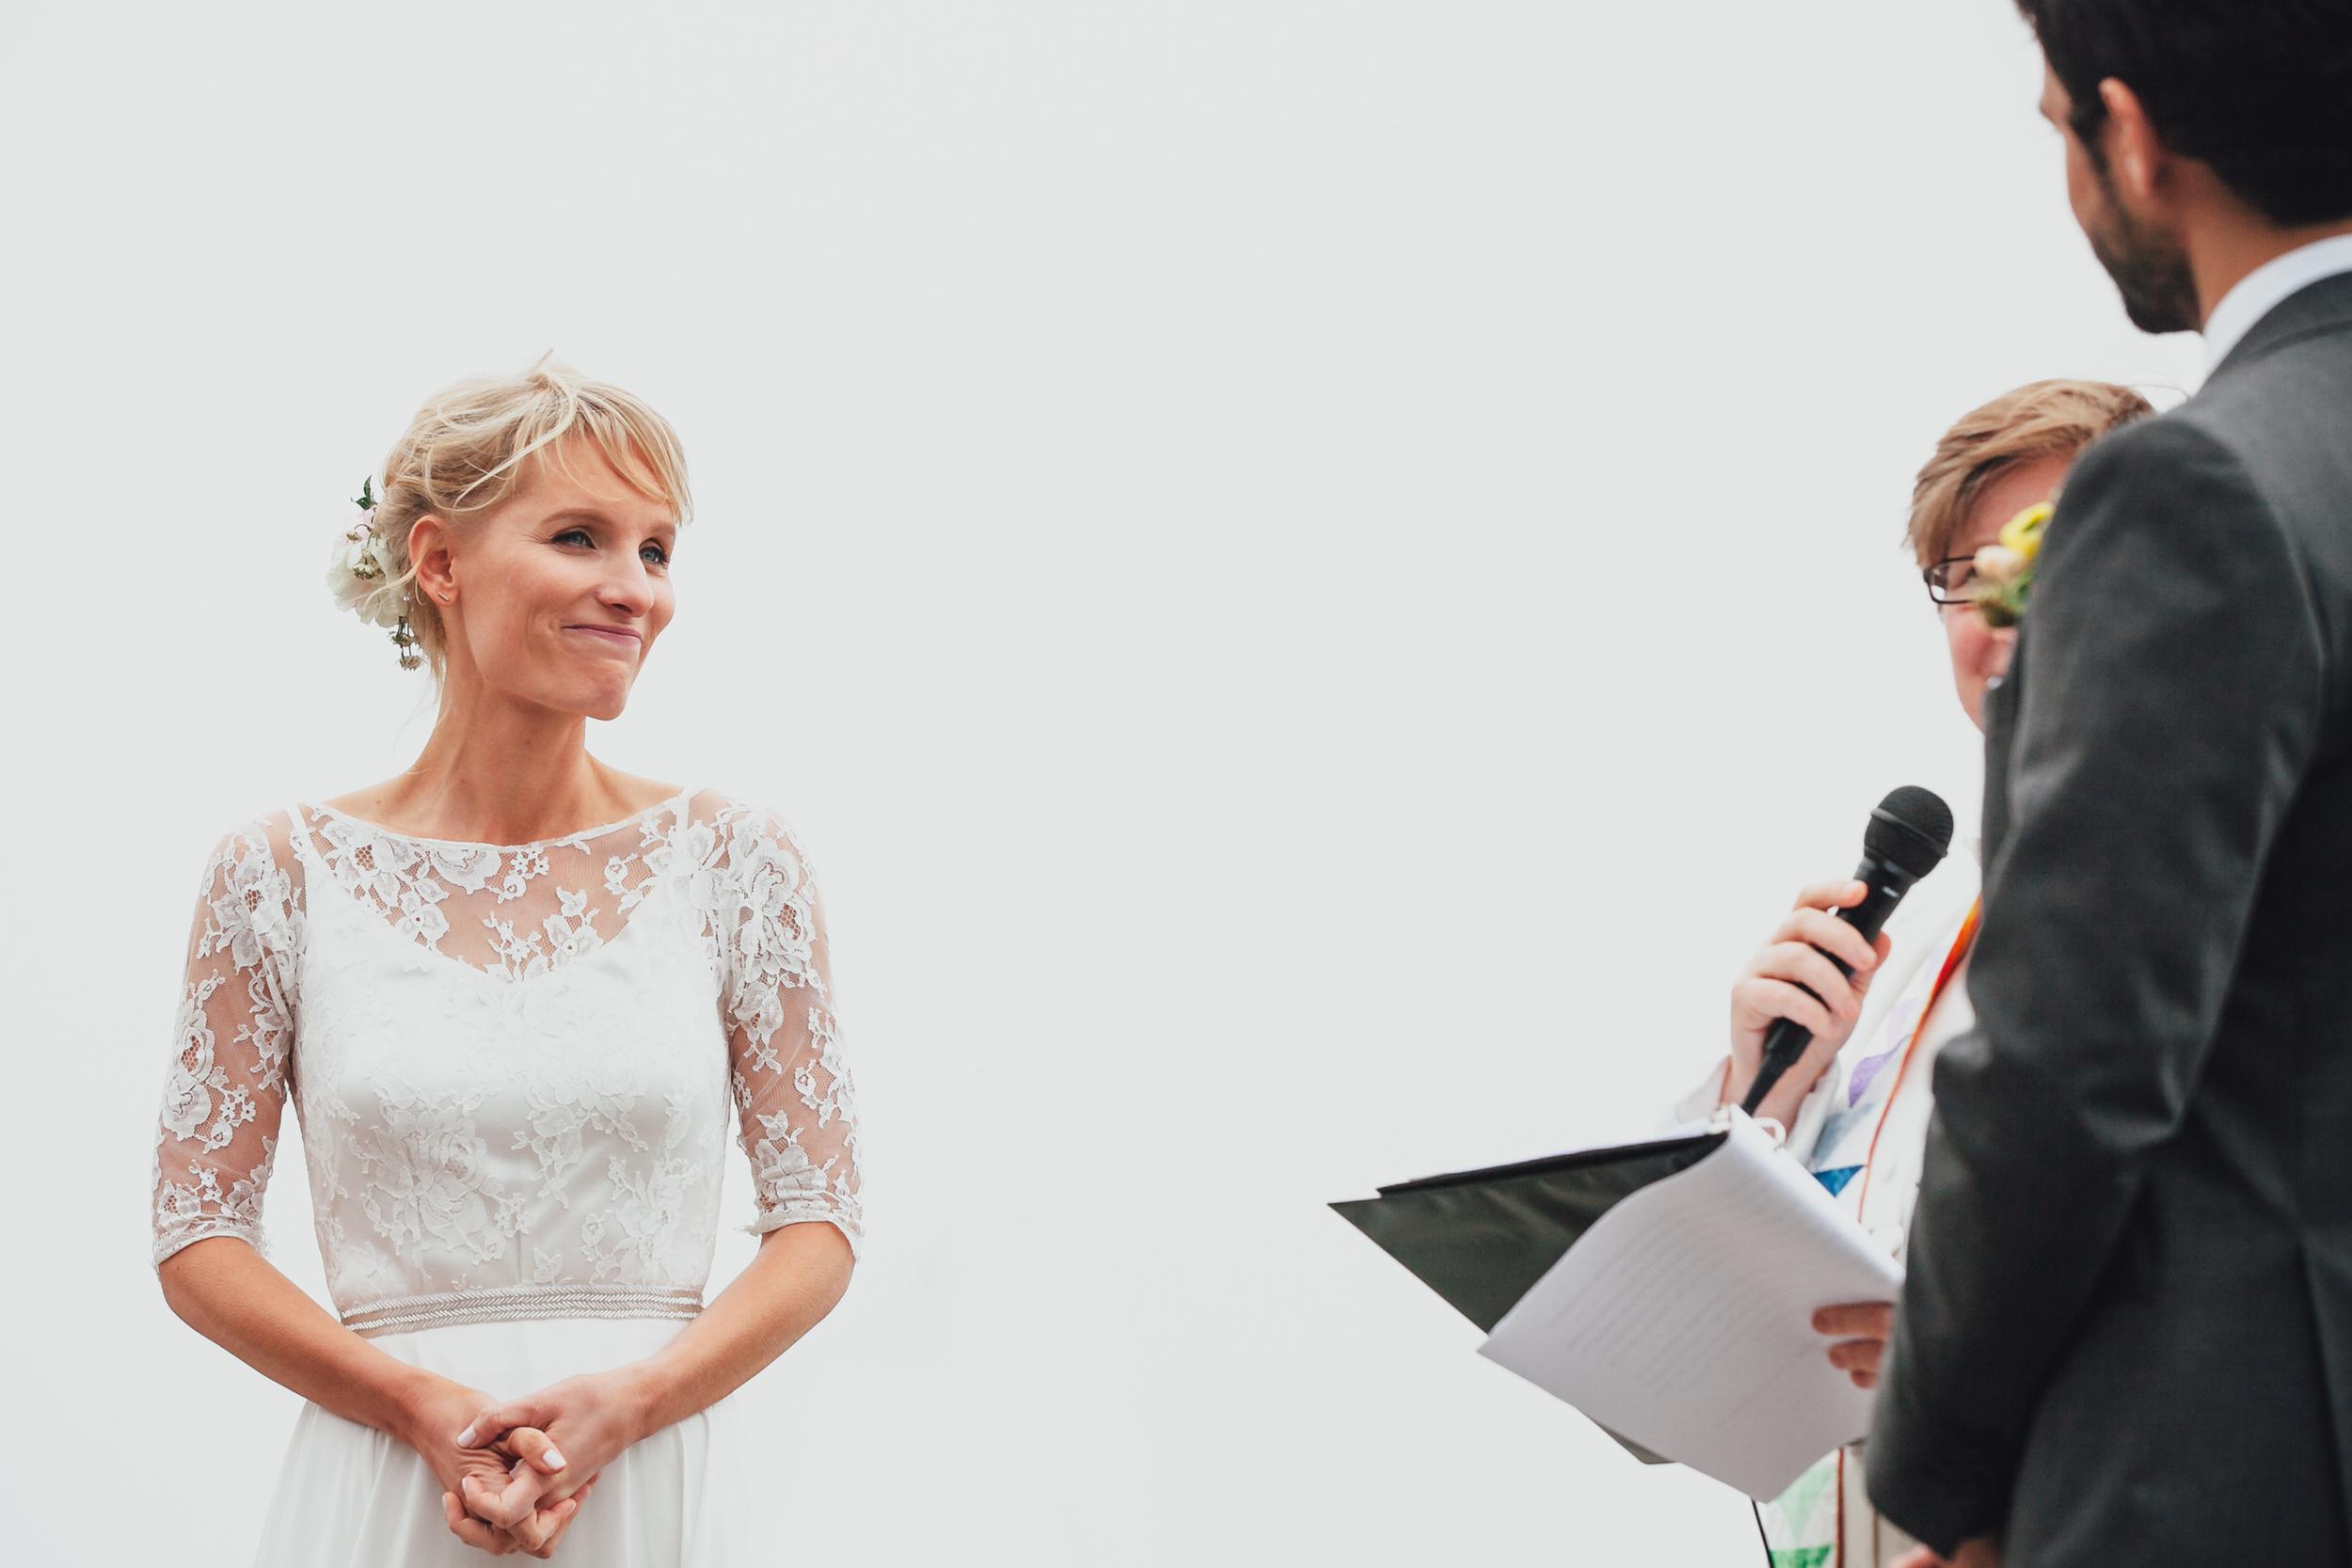 erinandmark-060615-ceremony-055.jpg